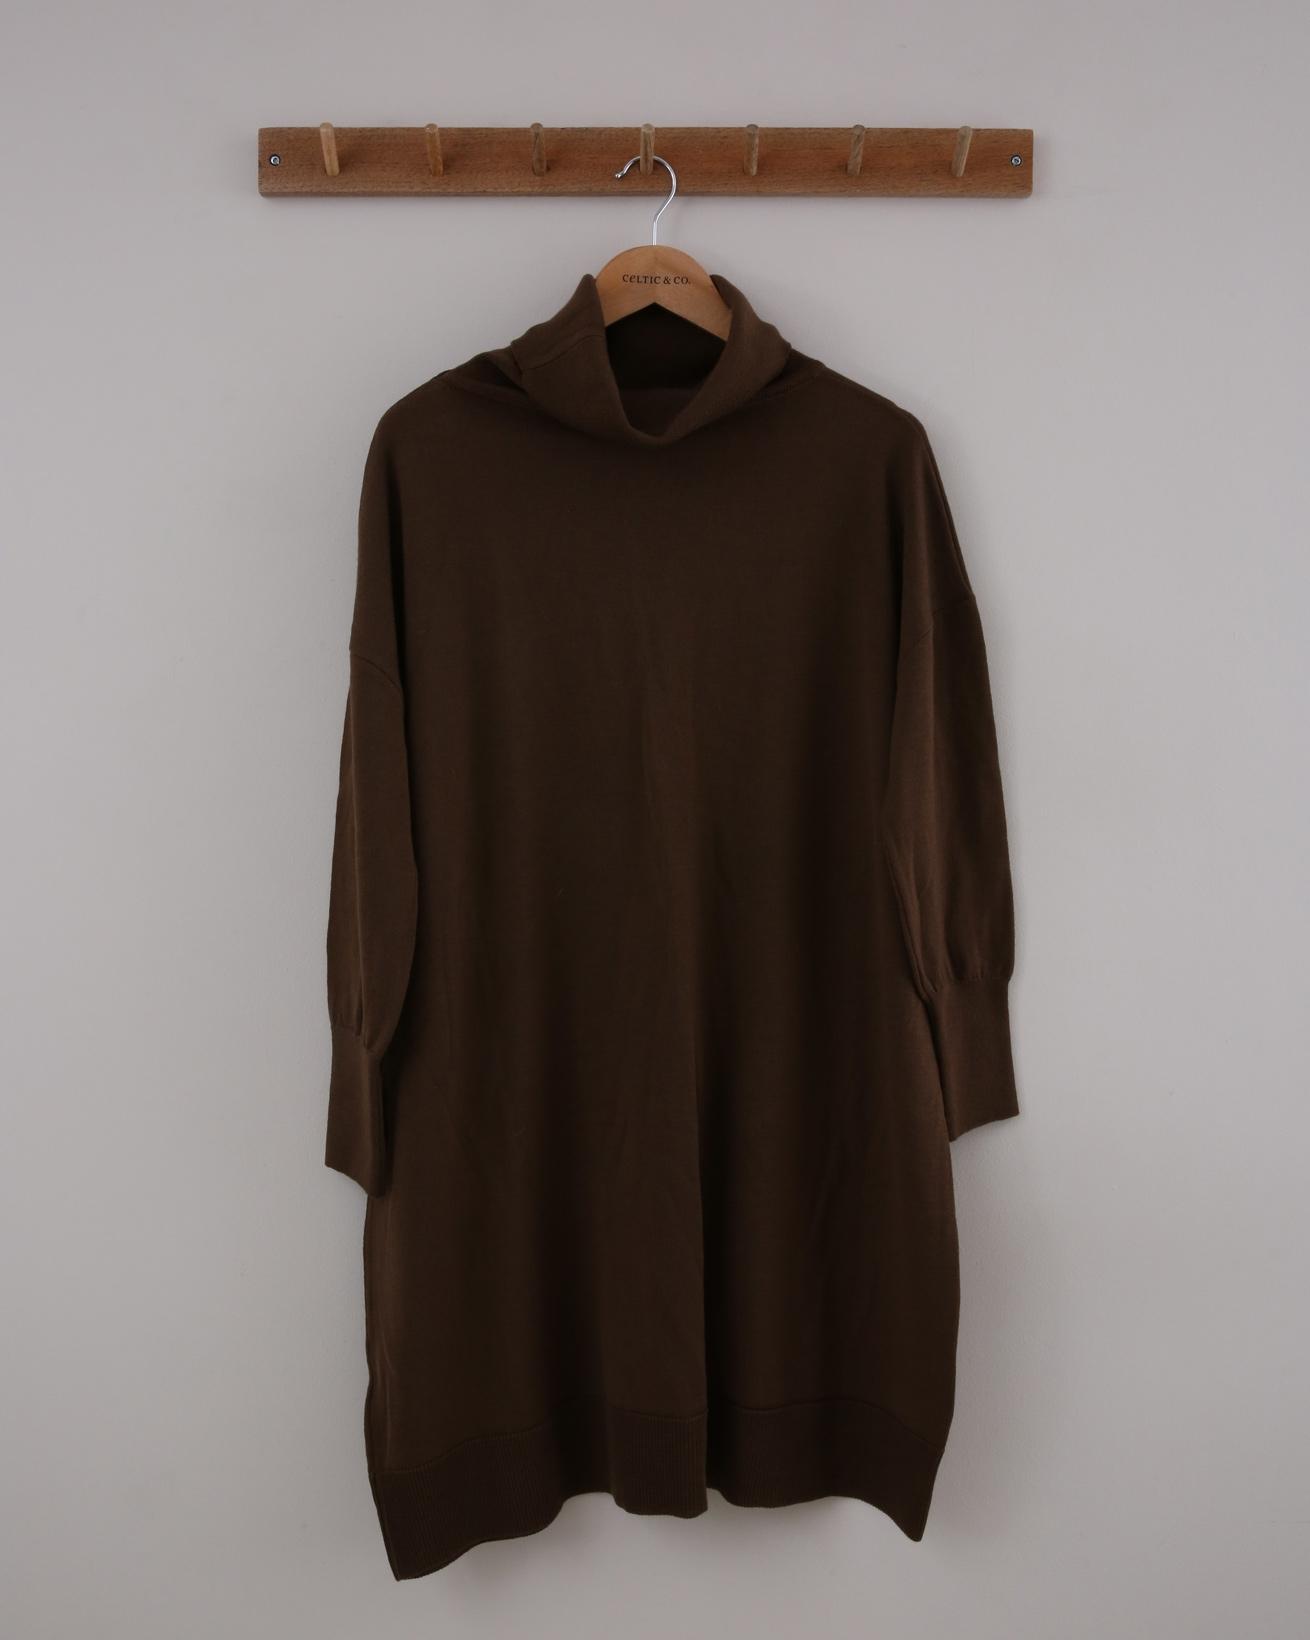 Slouchy Merino Dress - Small - Brown - 1415